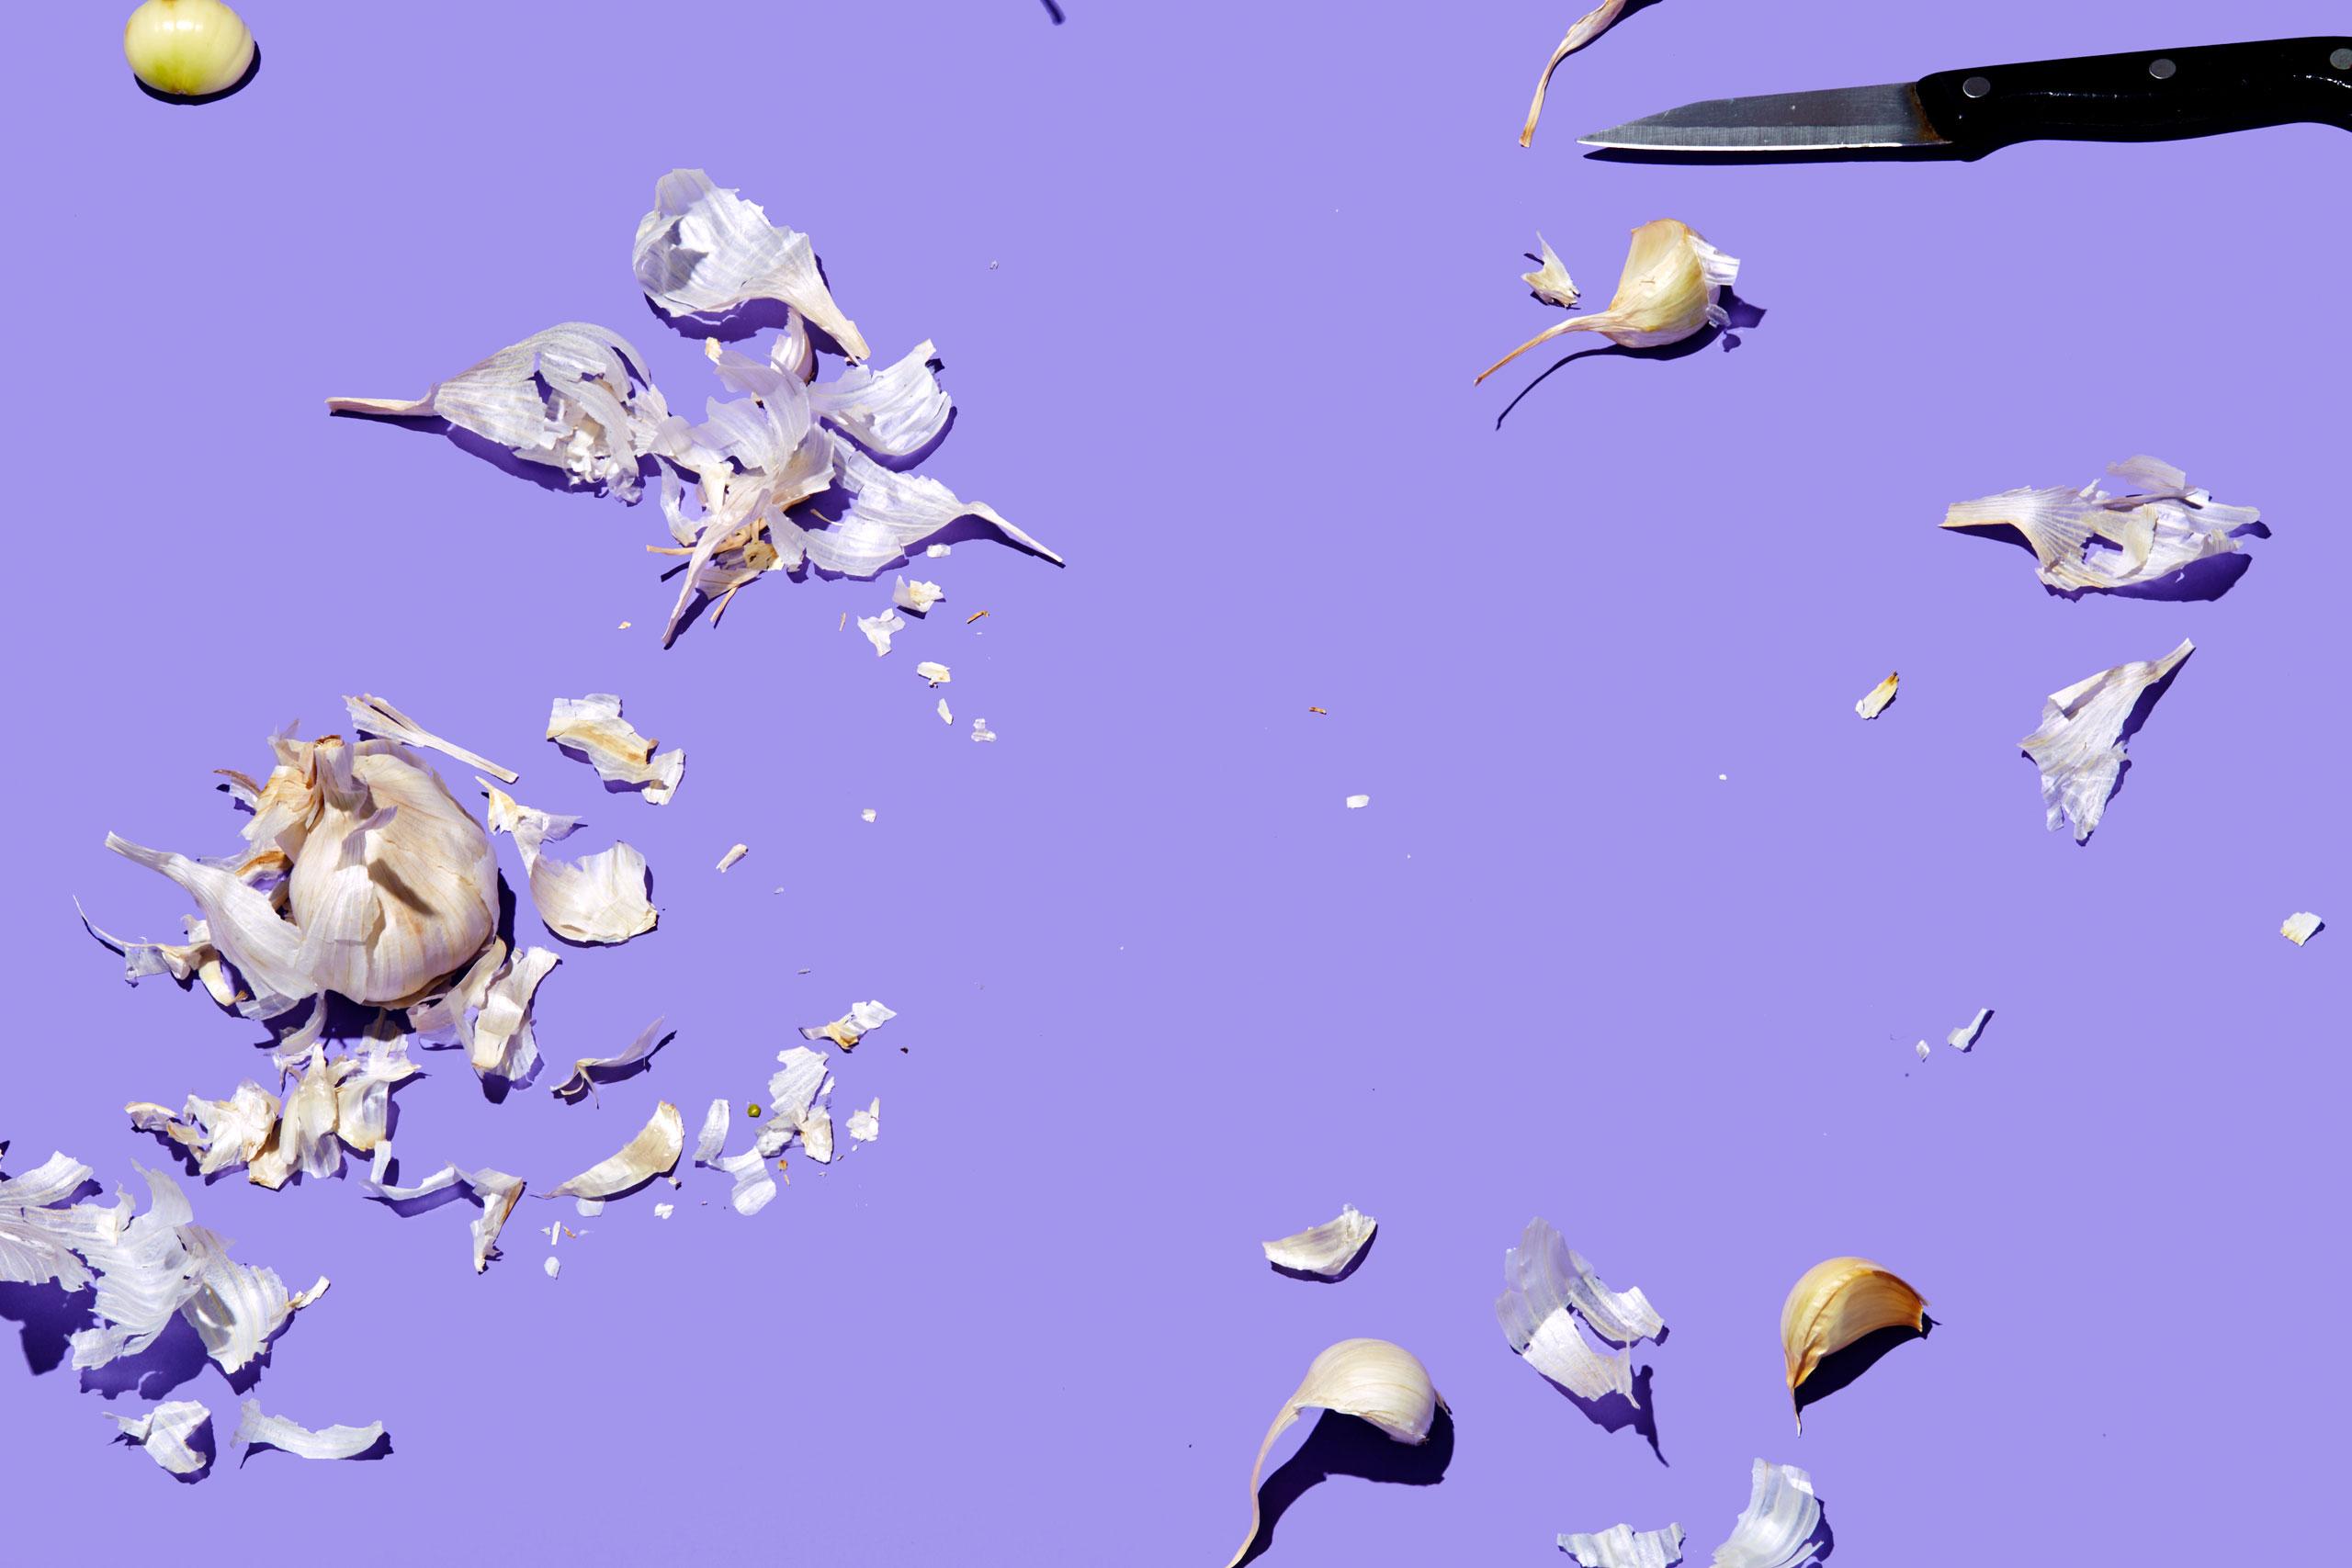 healthiest foods, health food, diet, nutrition, time.com stock, garlic